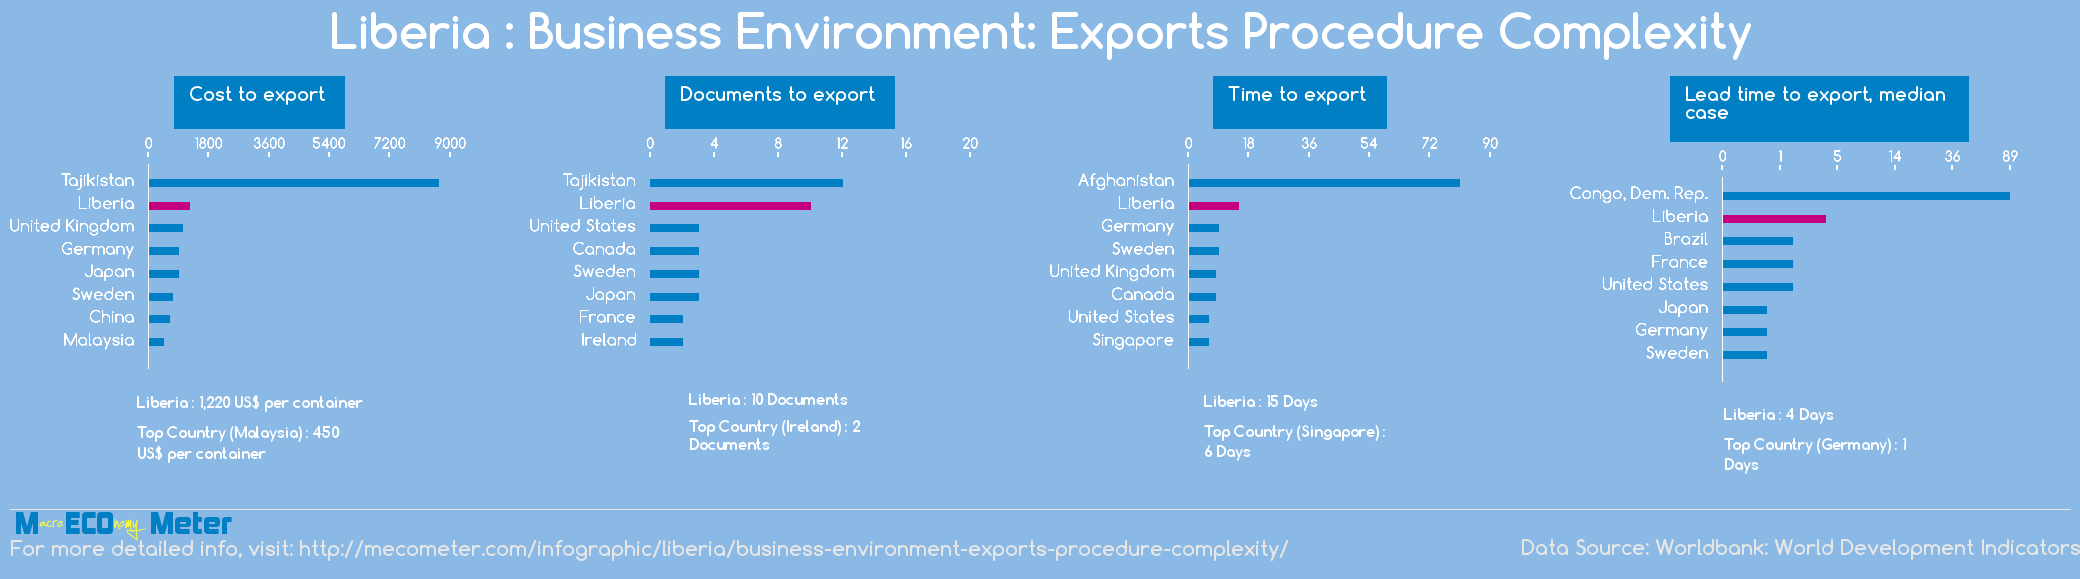 Liberia : Business Environment: Exports Procedure Complexity